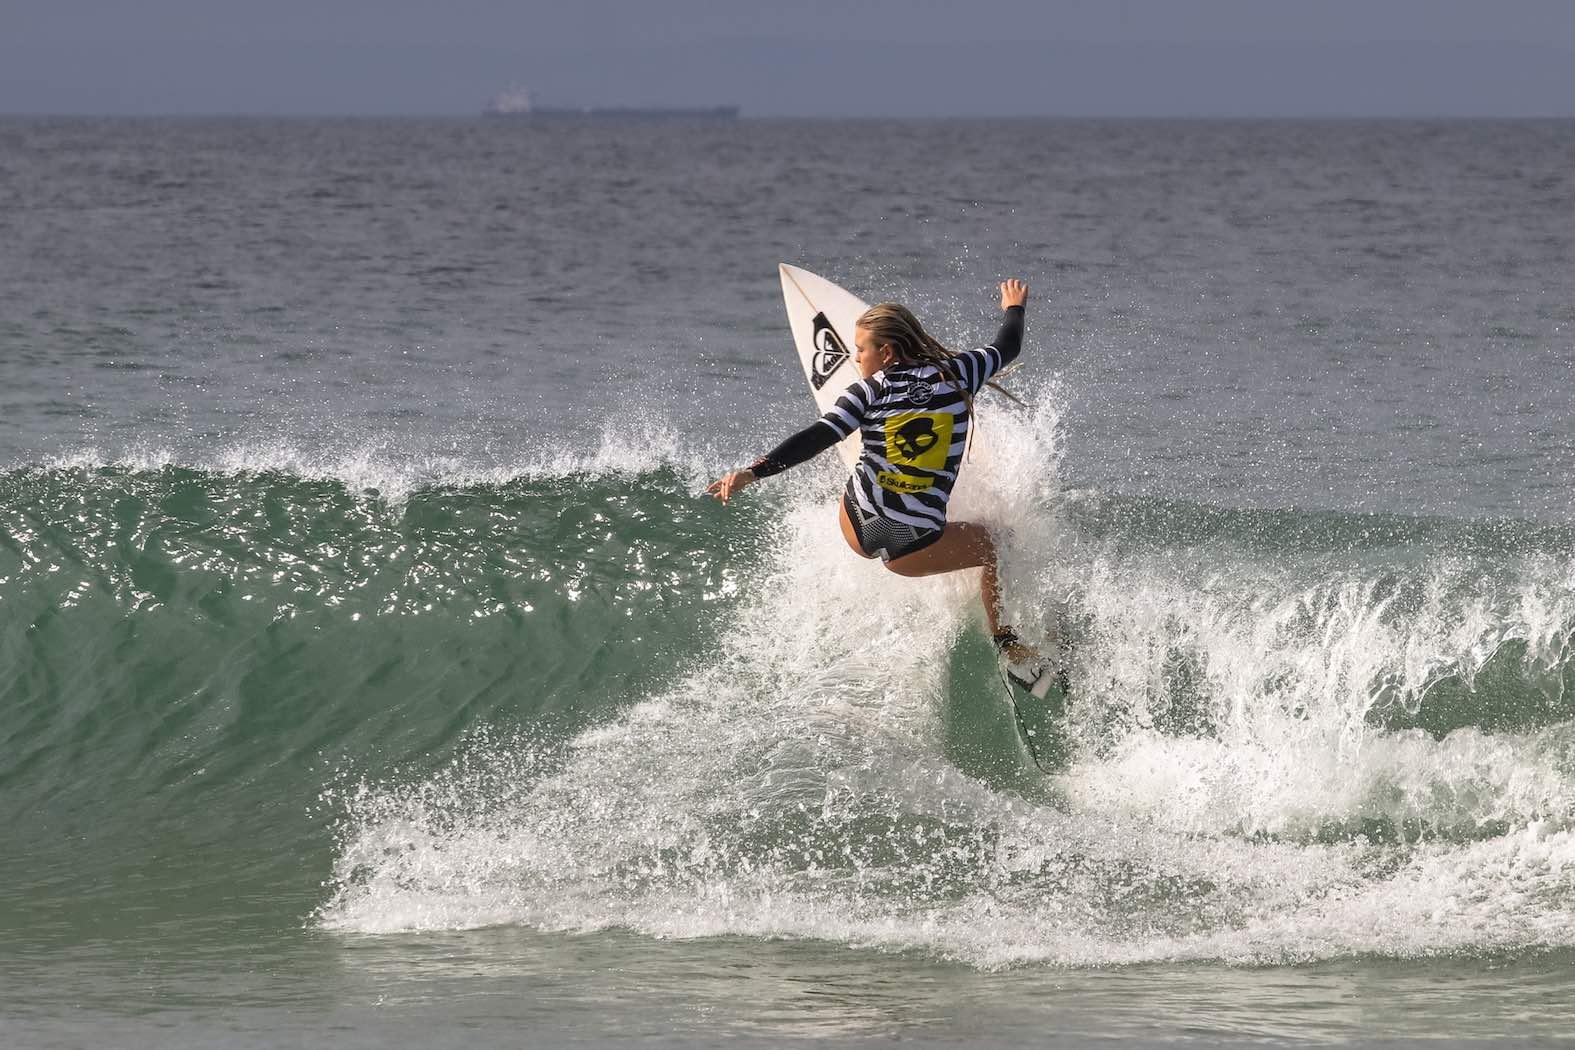 Sophie Bell surfing in the Volkswagen Nelson Mandela Bay Surf Pro